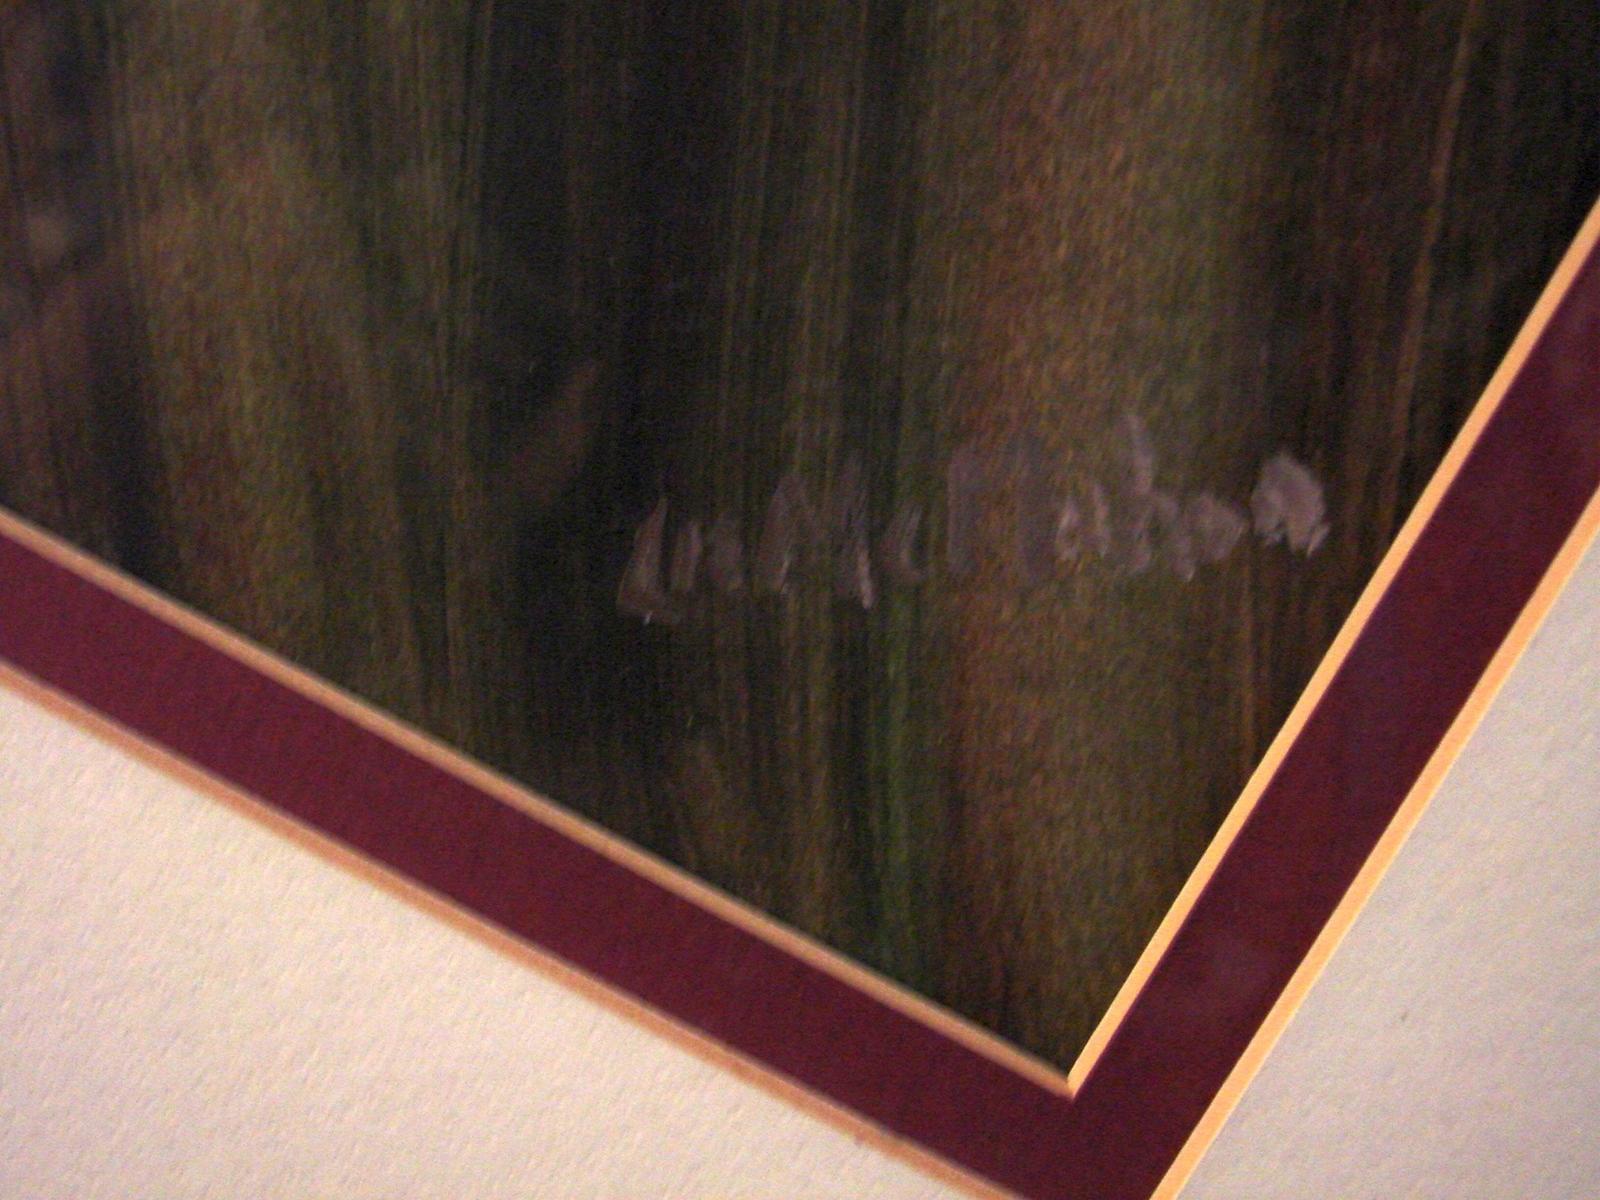 Elizabeth McMahon Painting Under Glass